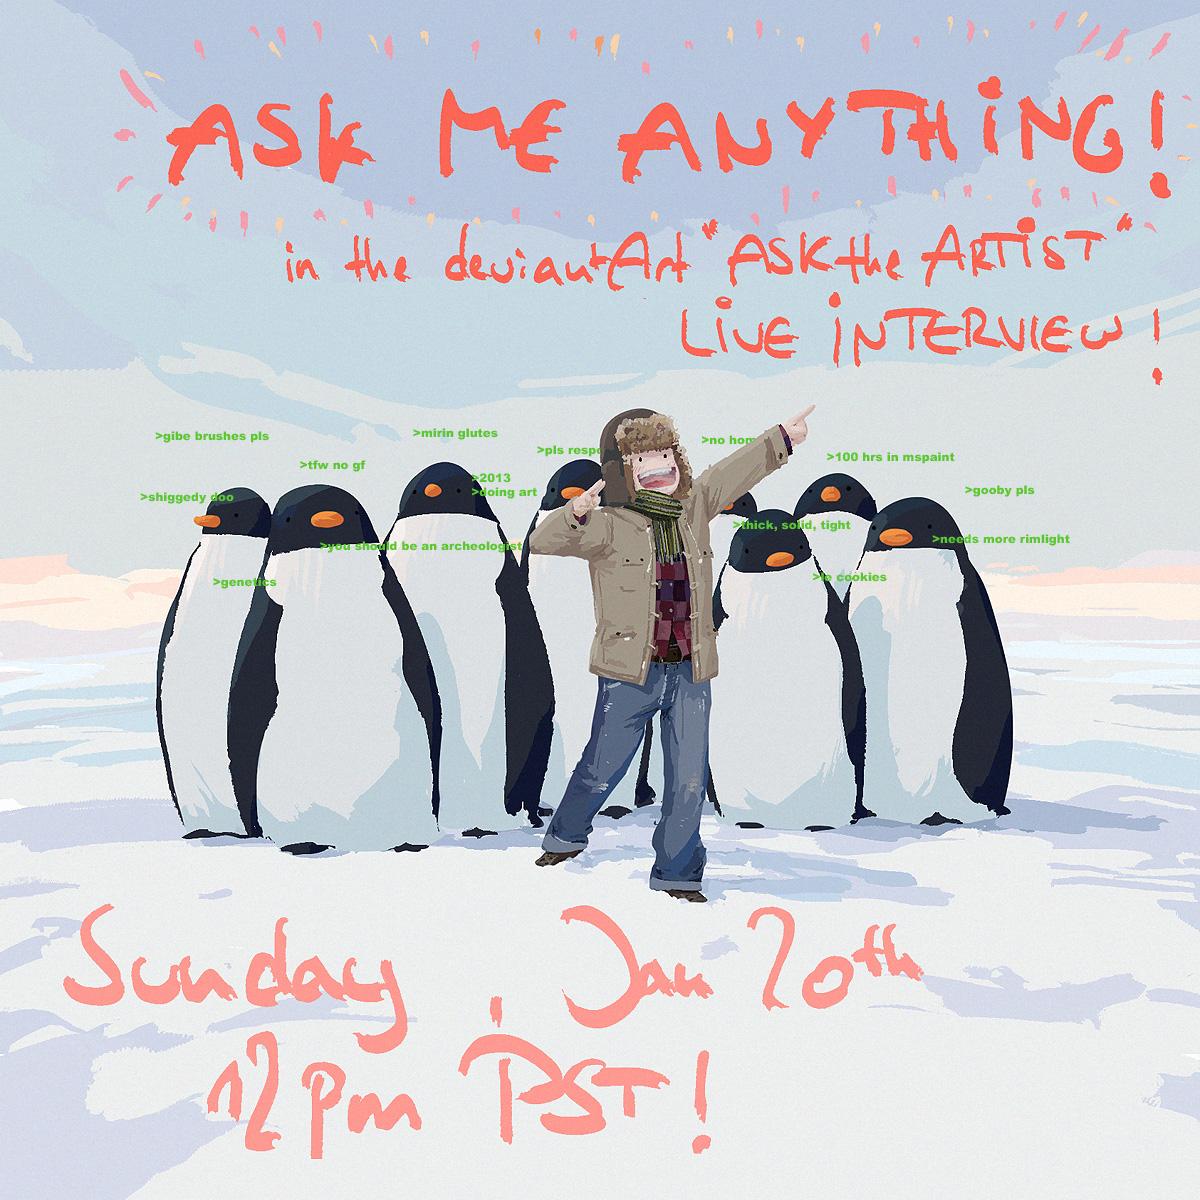 Ask the Artist Interview! by algenpfleger